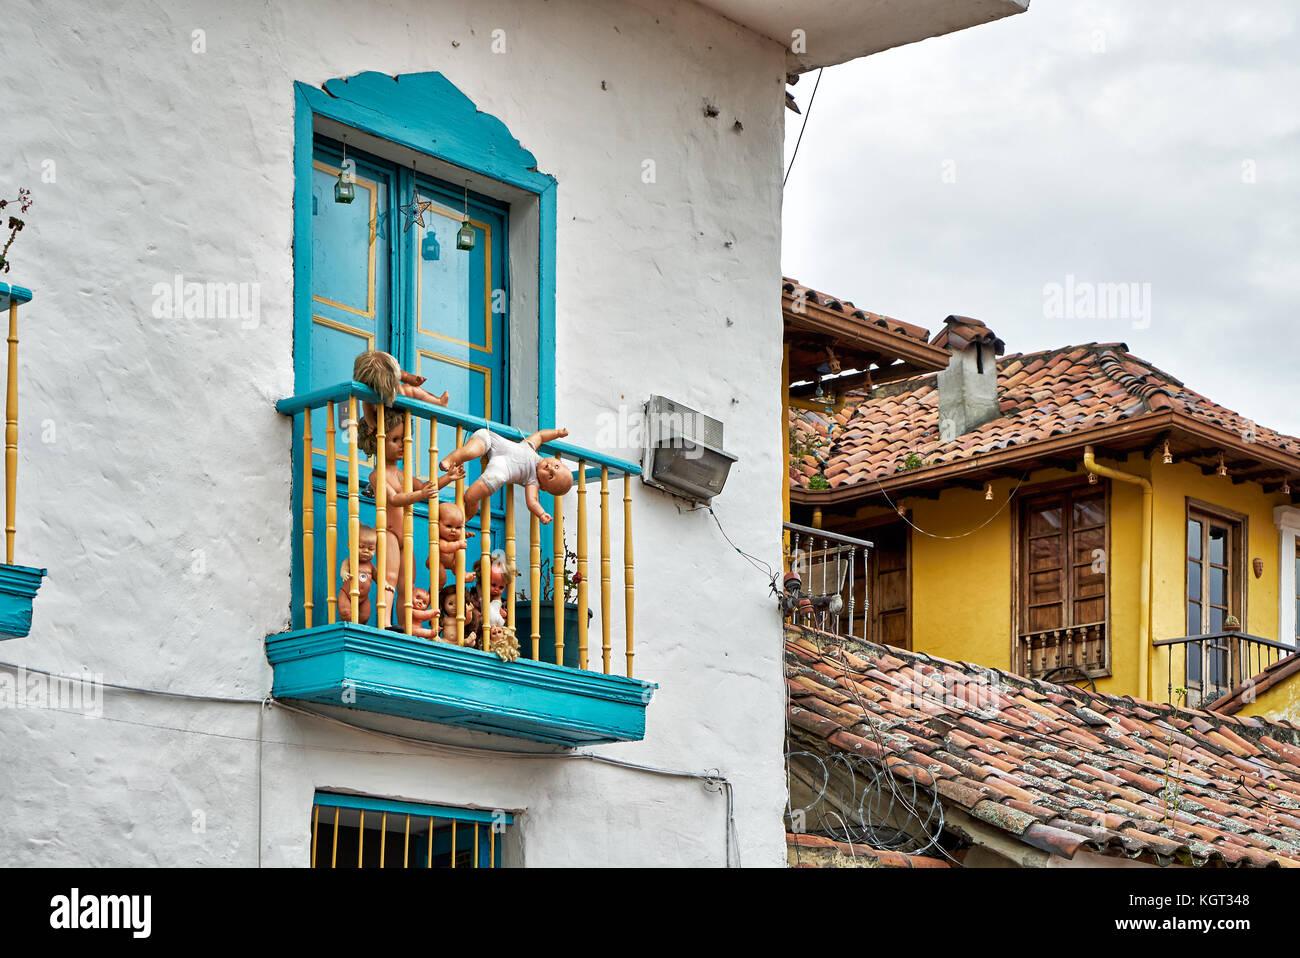 Typisches Gebaeude im Stadtteil La Candelaria, Bogotà, Kolumbien, Suedamerika |tipico edificio in Candelaria, Immagini Stock